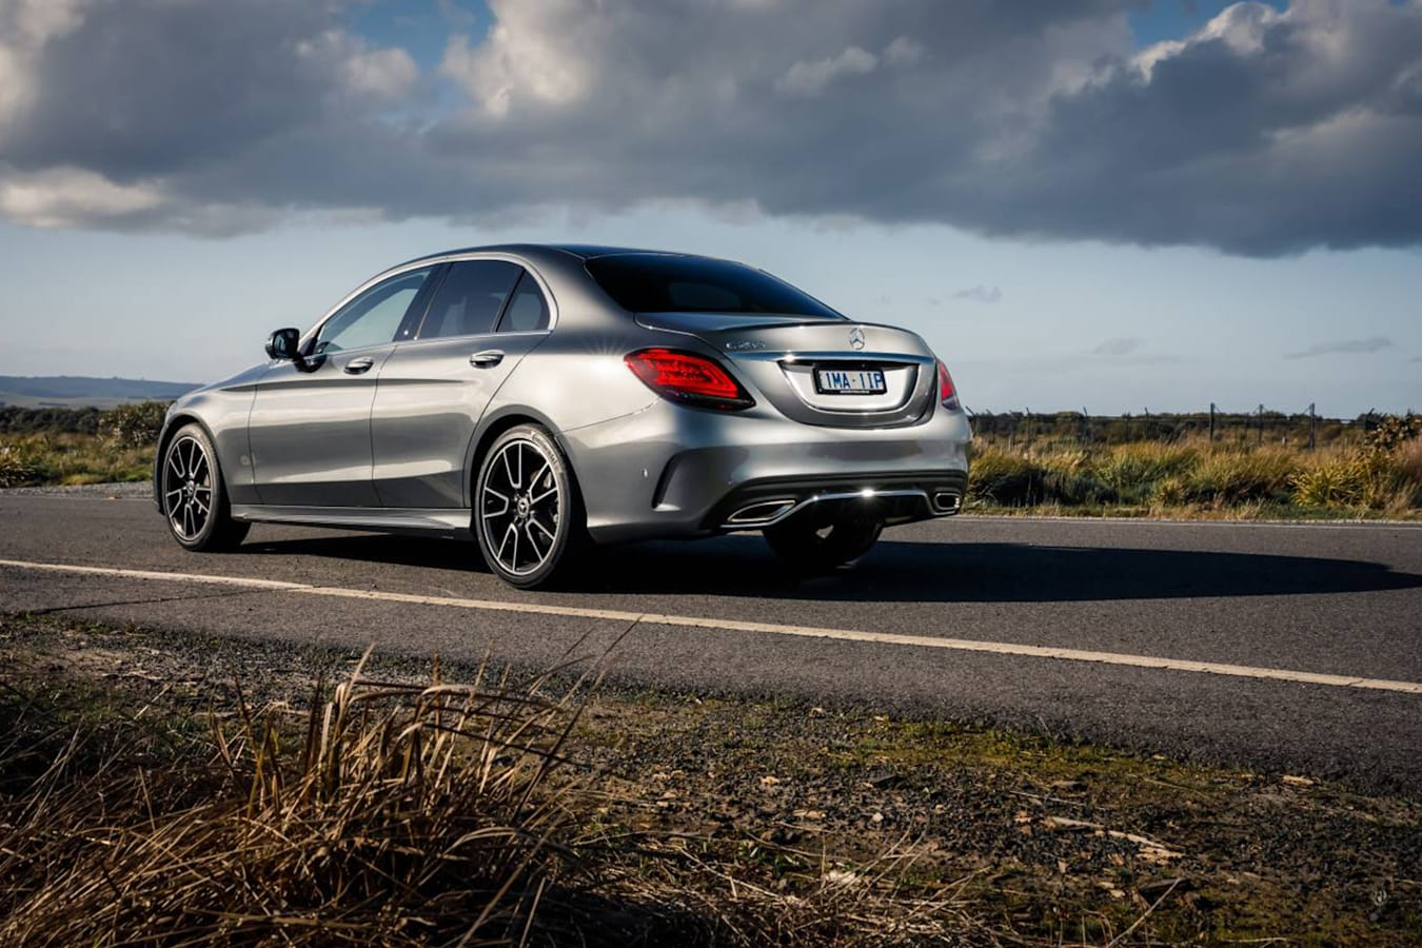 Mercedes C 200 Rearend Jpg